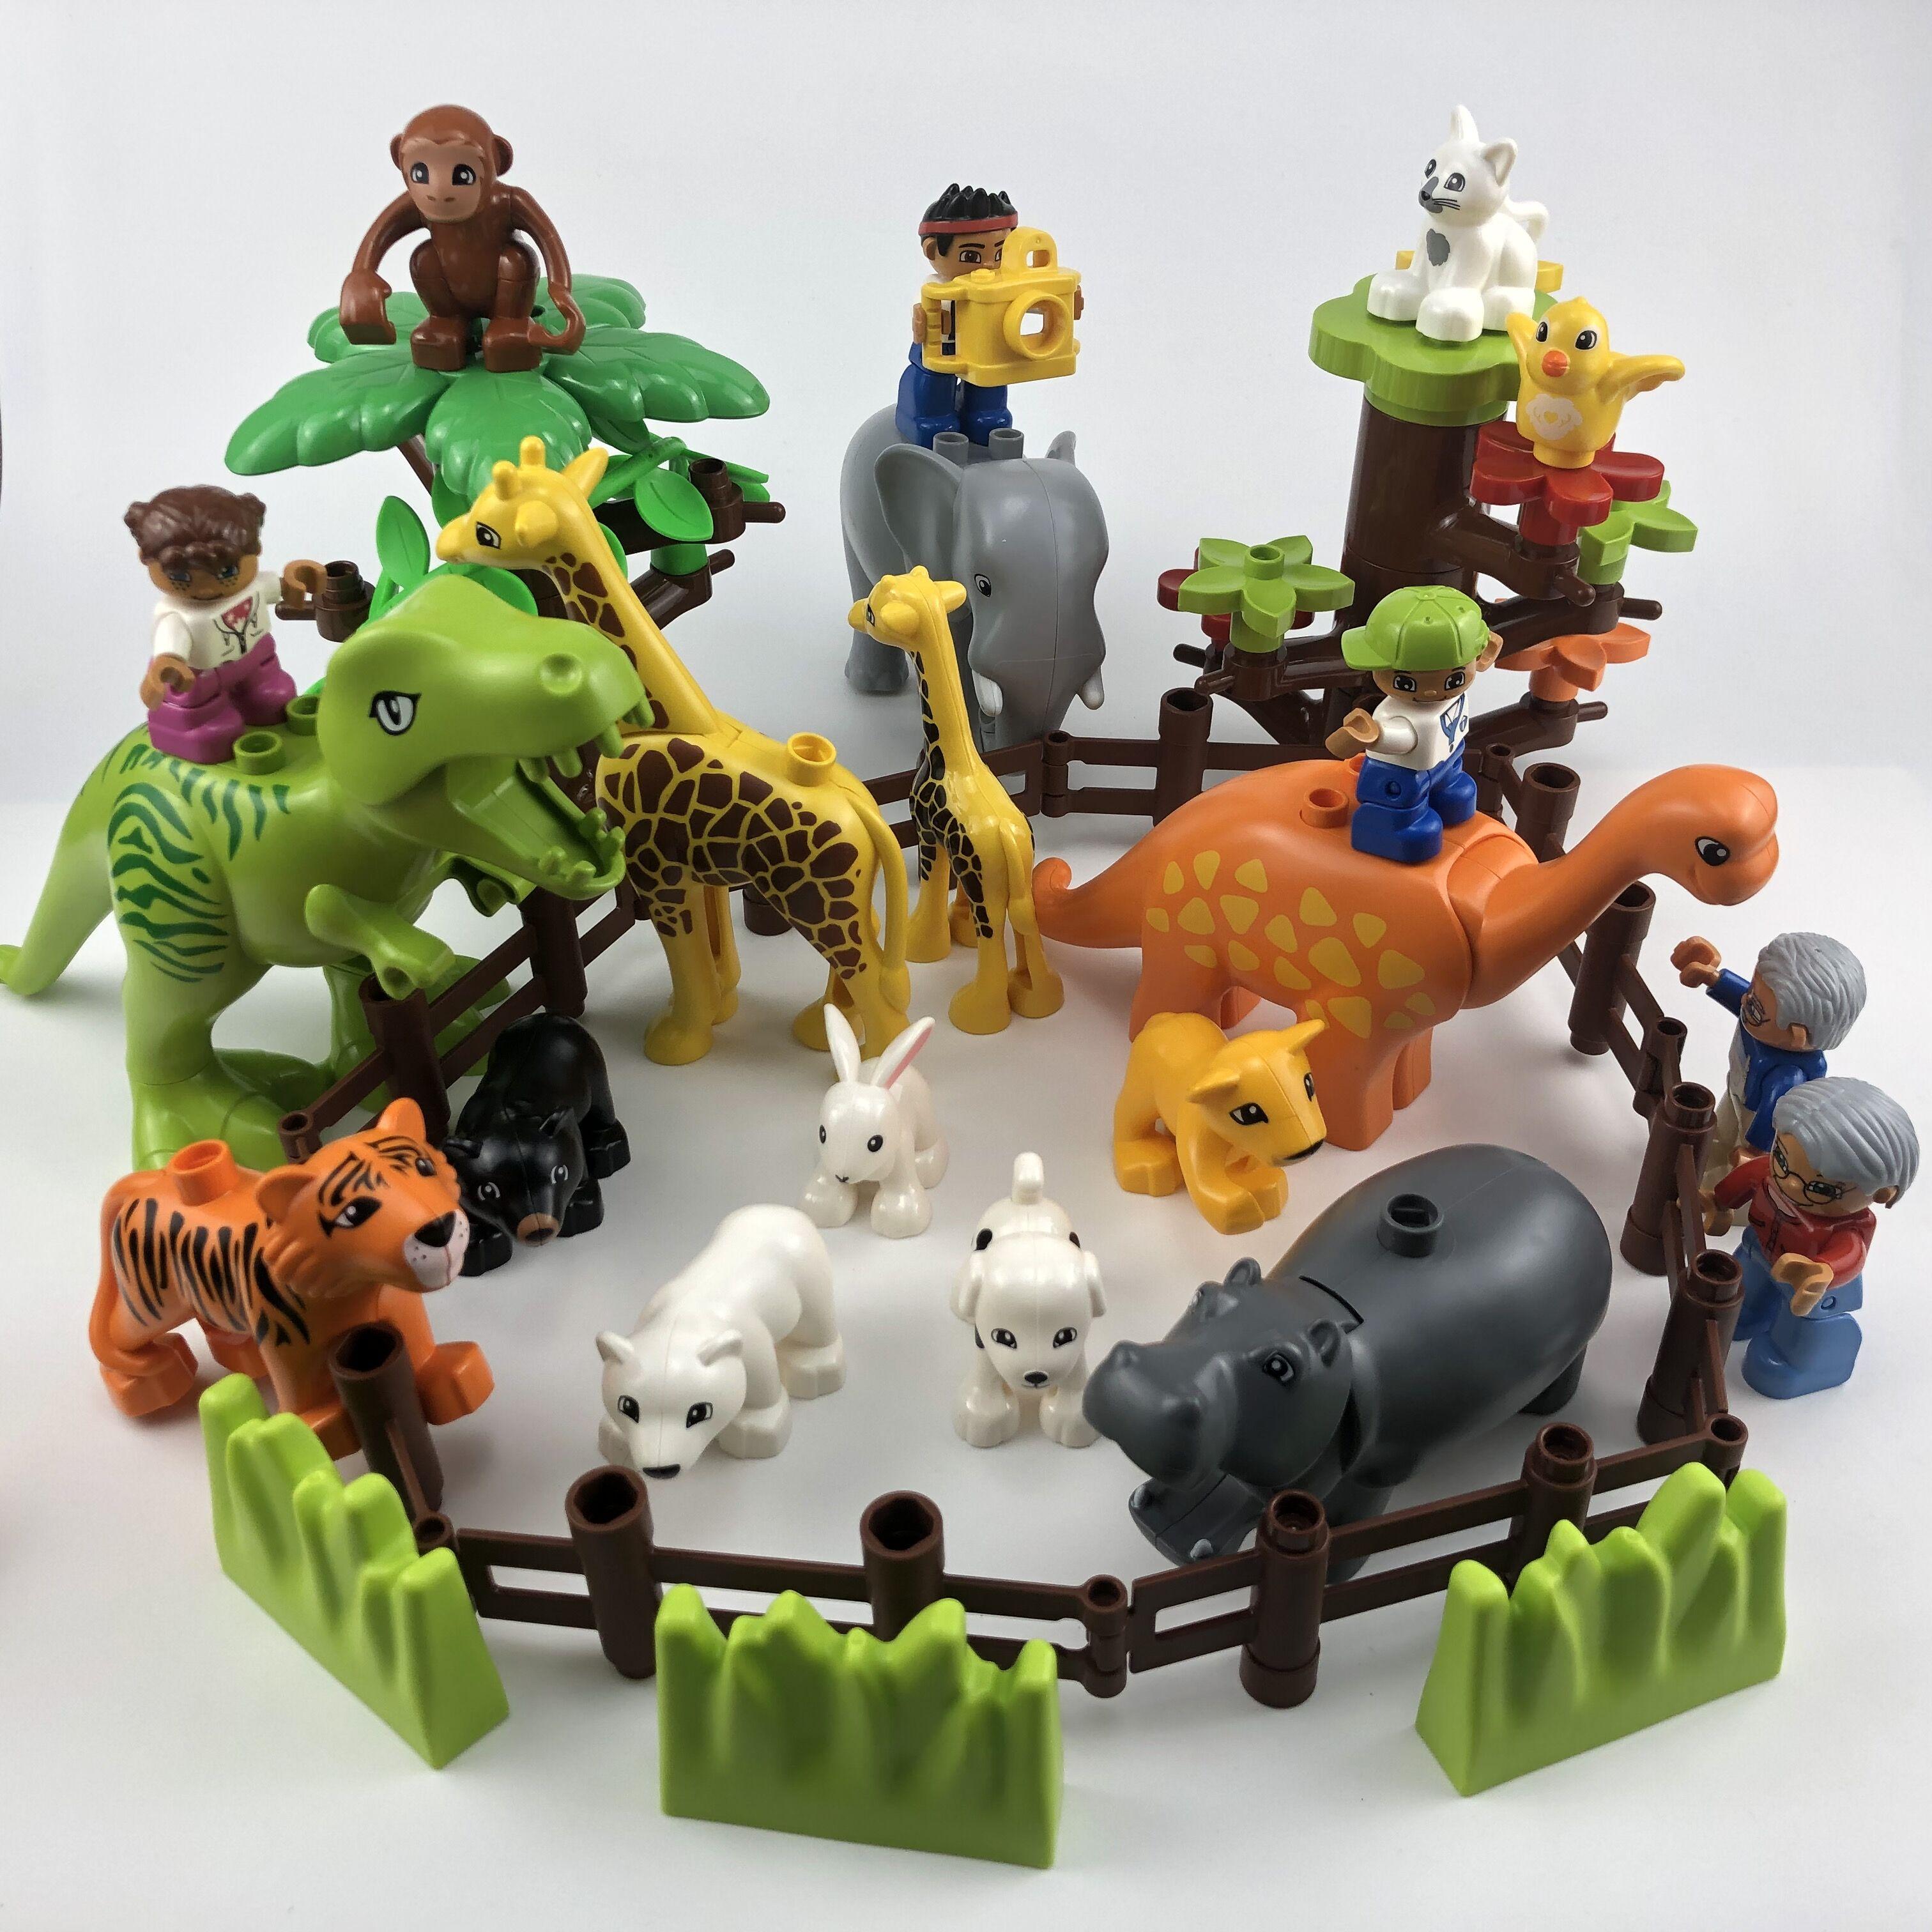 Locking Duplo Animals Zoo Sheep Monkey Dog Beer Rabbit Bird Building Blocks Toys for Children Compatible Duplo Locking Figures 1